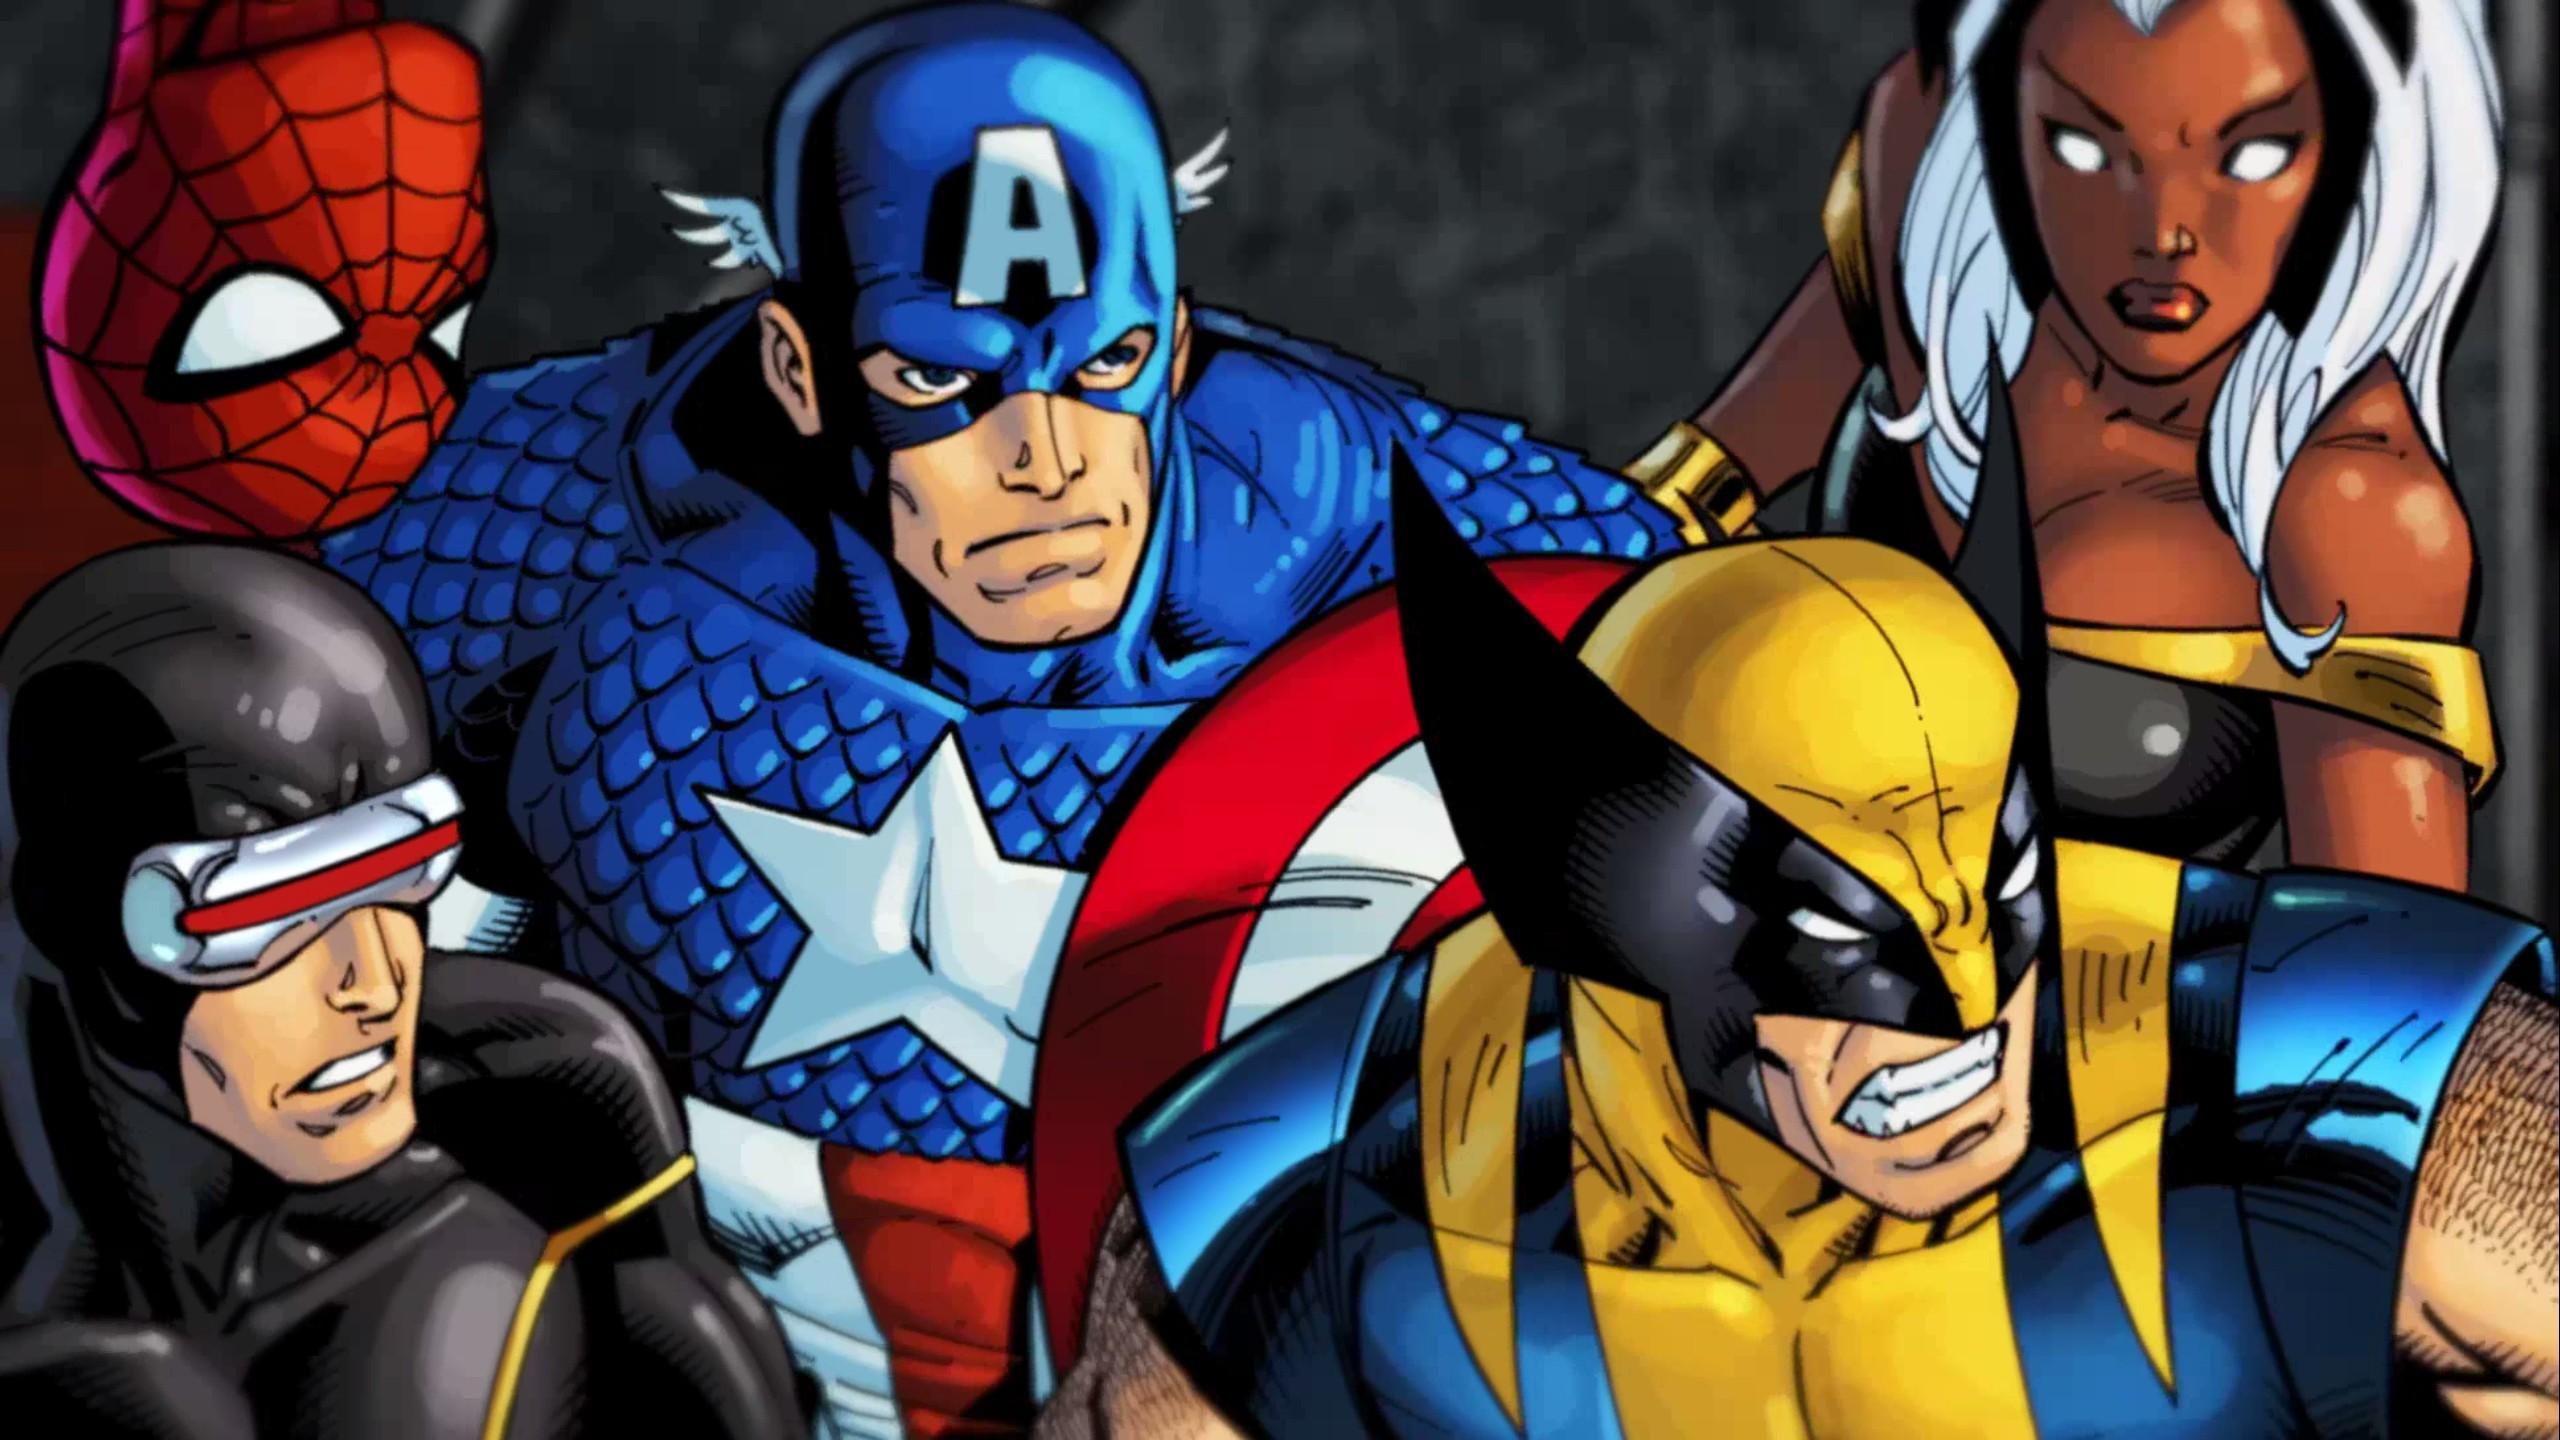 marvel heroes HD Wallpapers Download Free marvel heroes Tumblr – Pinterest  Hd Wallpapers